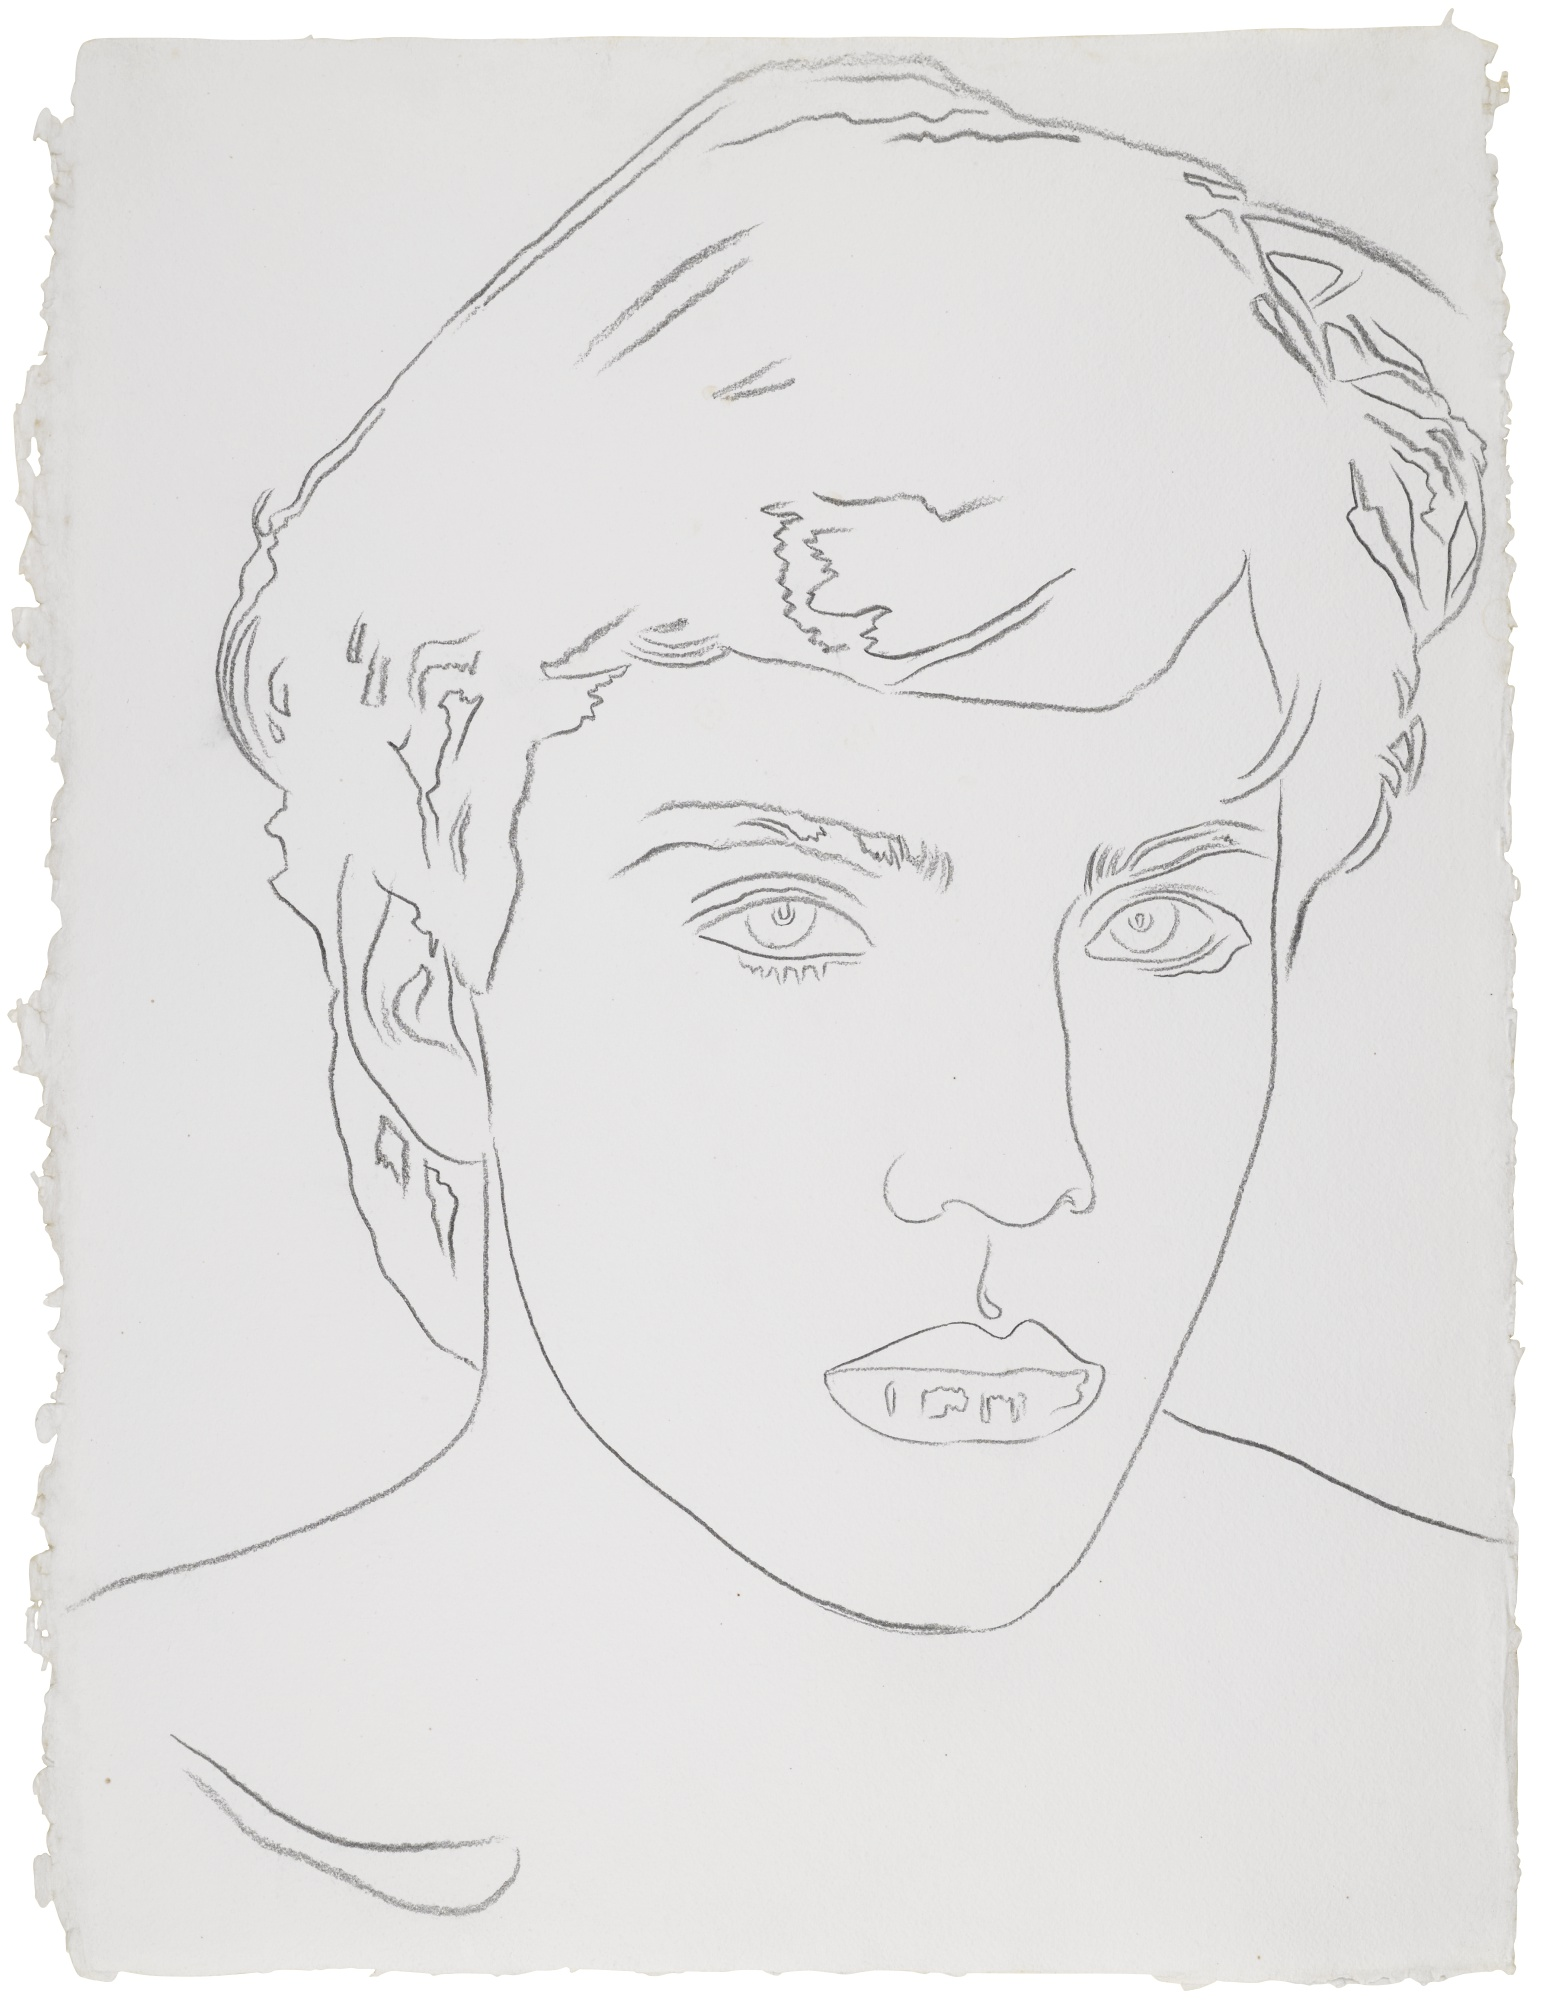 Andy Warhol-Jock Soto-1986